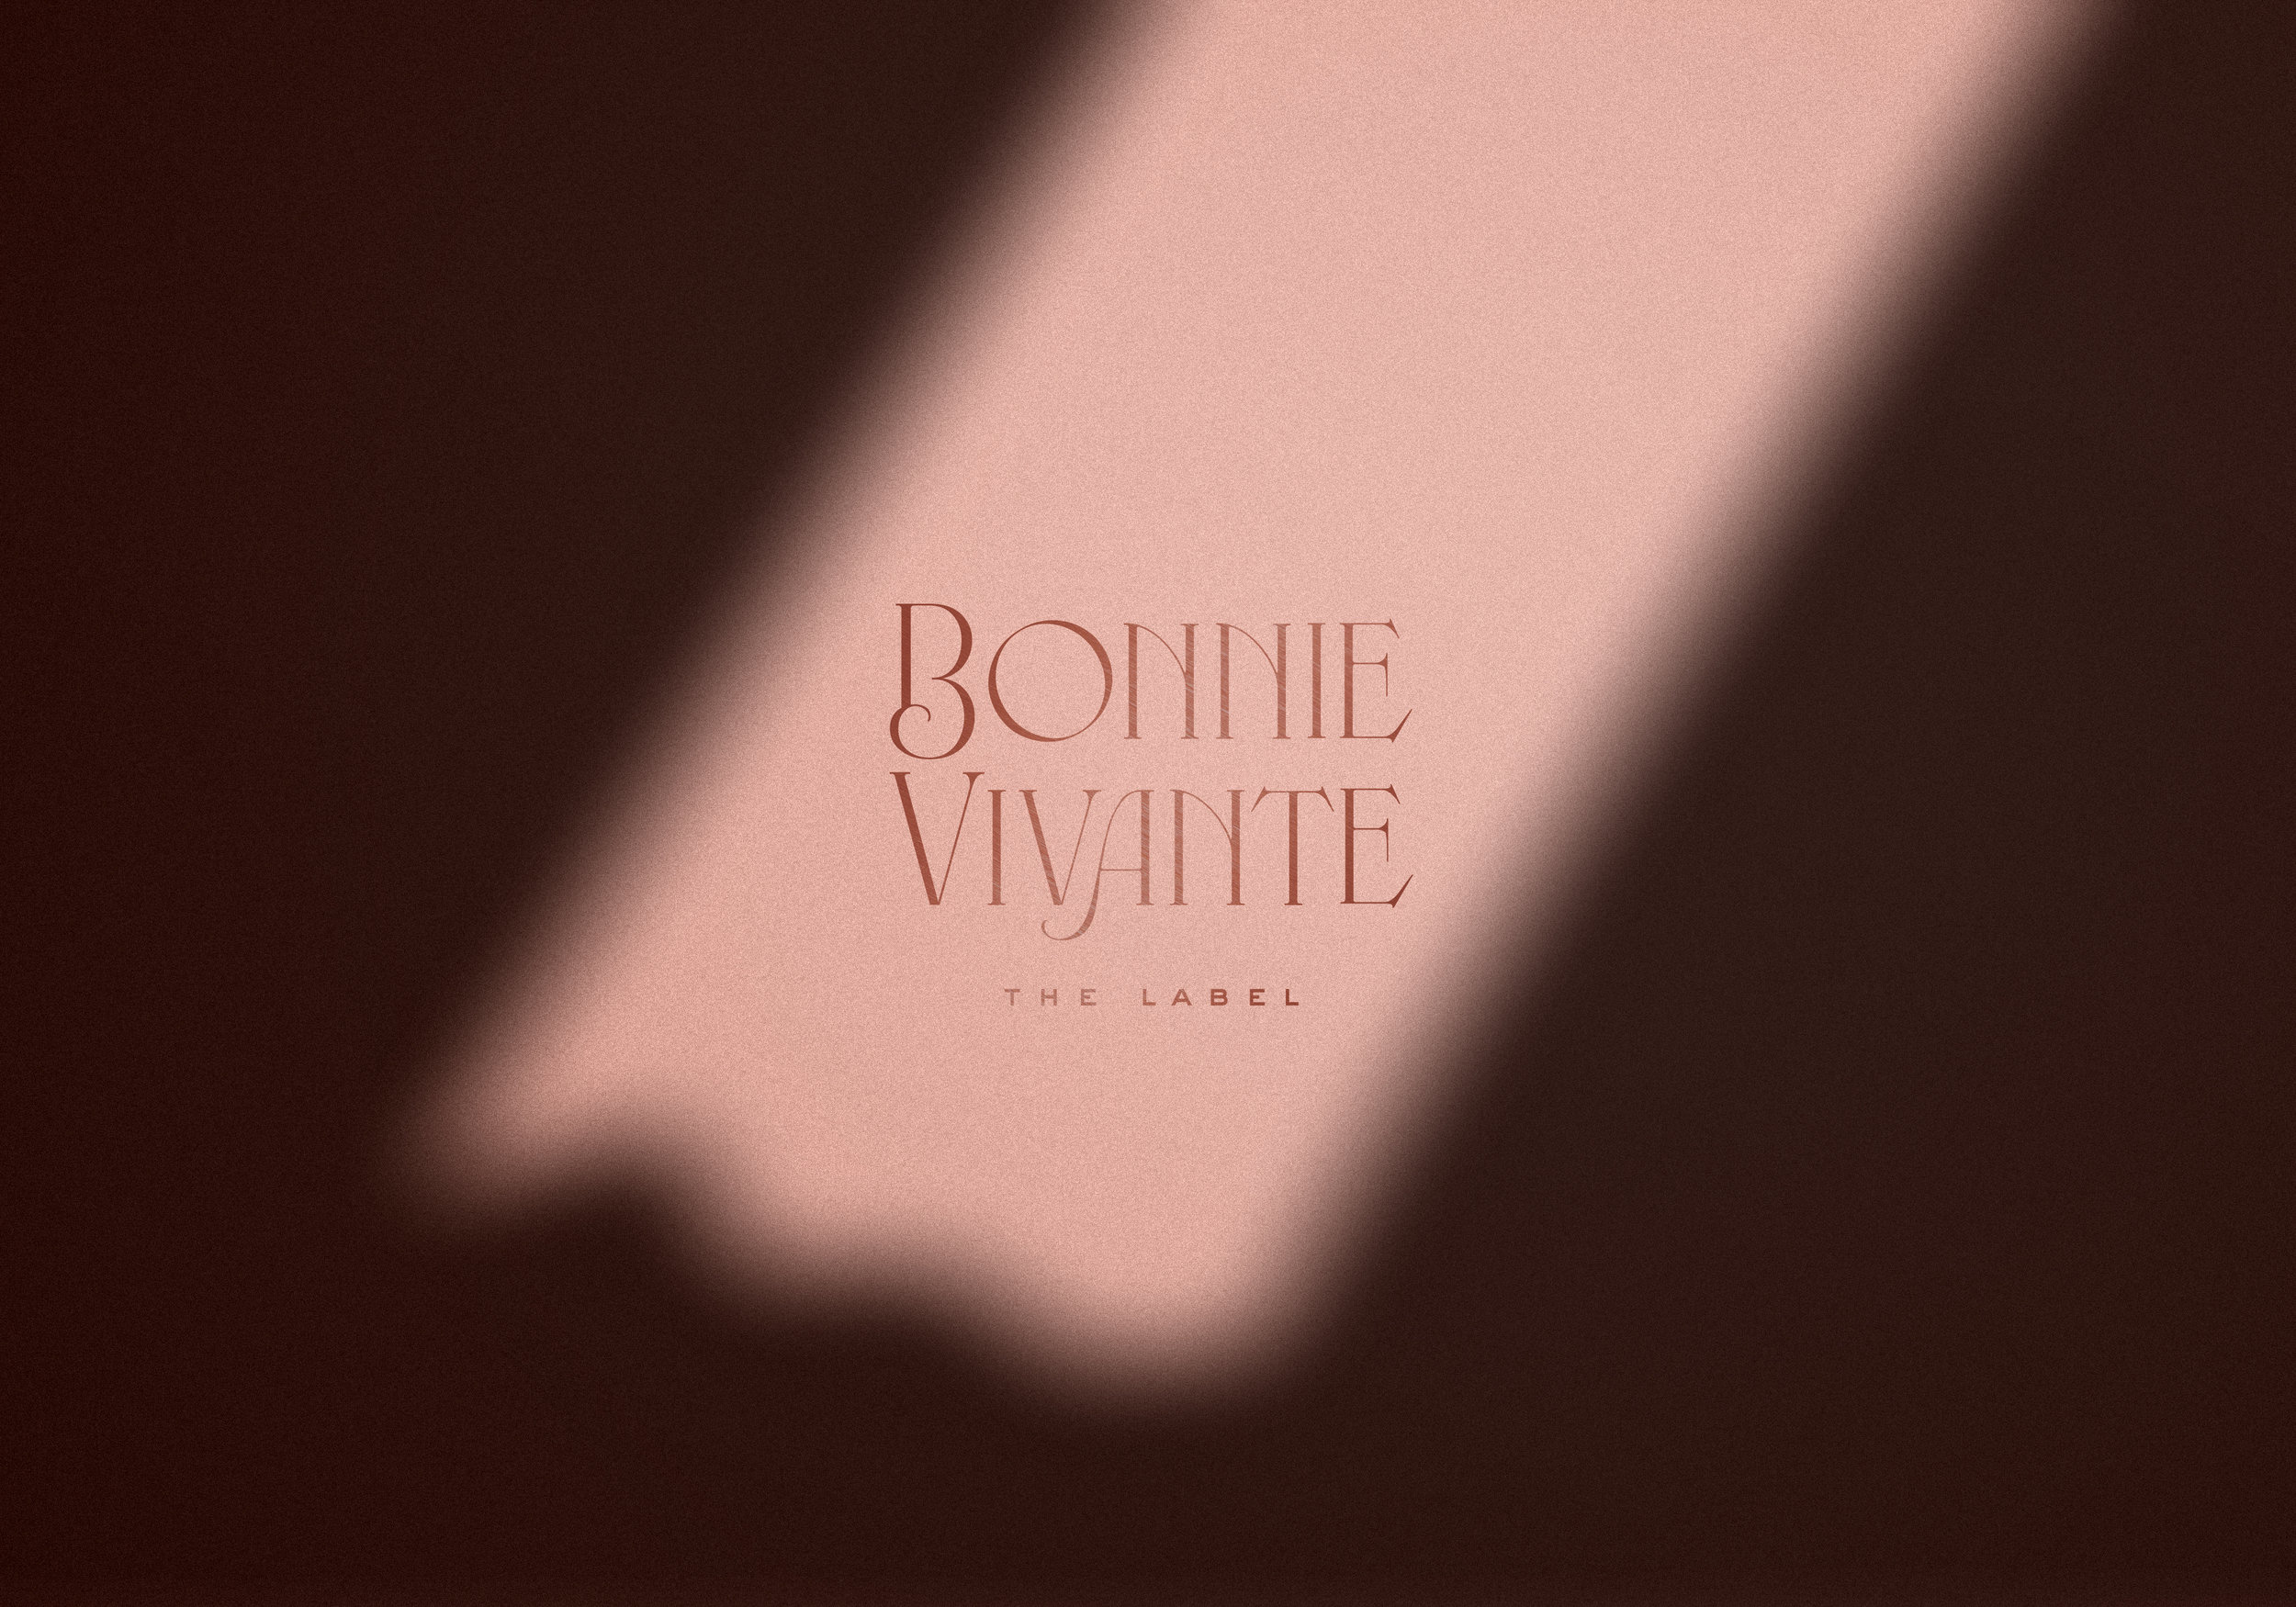 bv-shadow-2.jpg